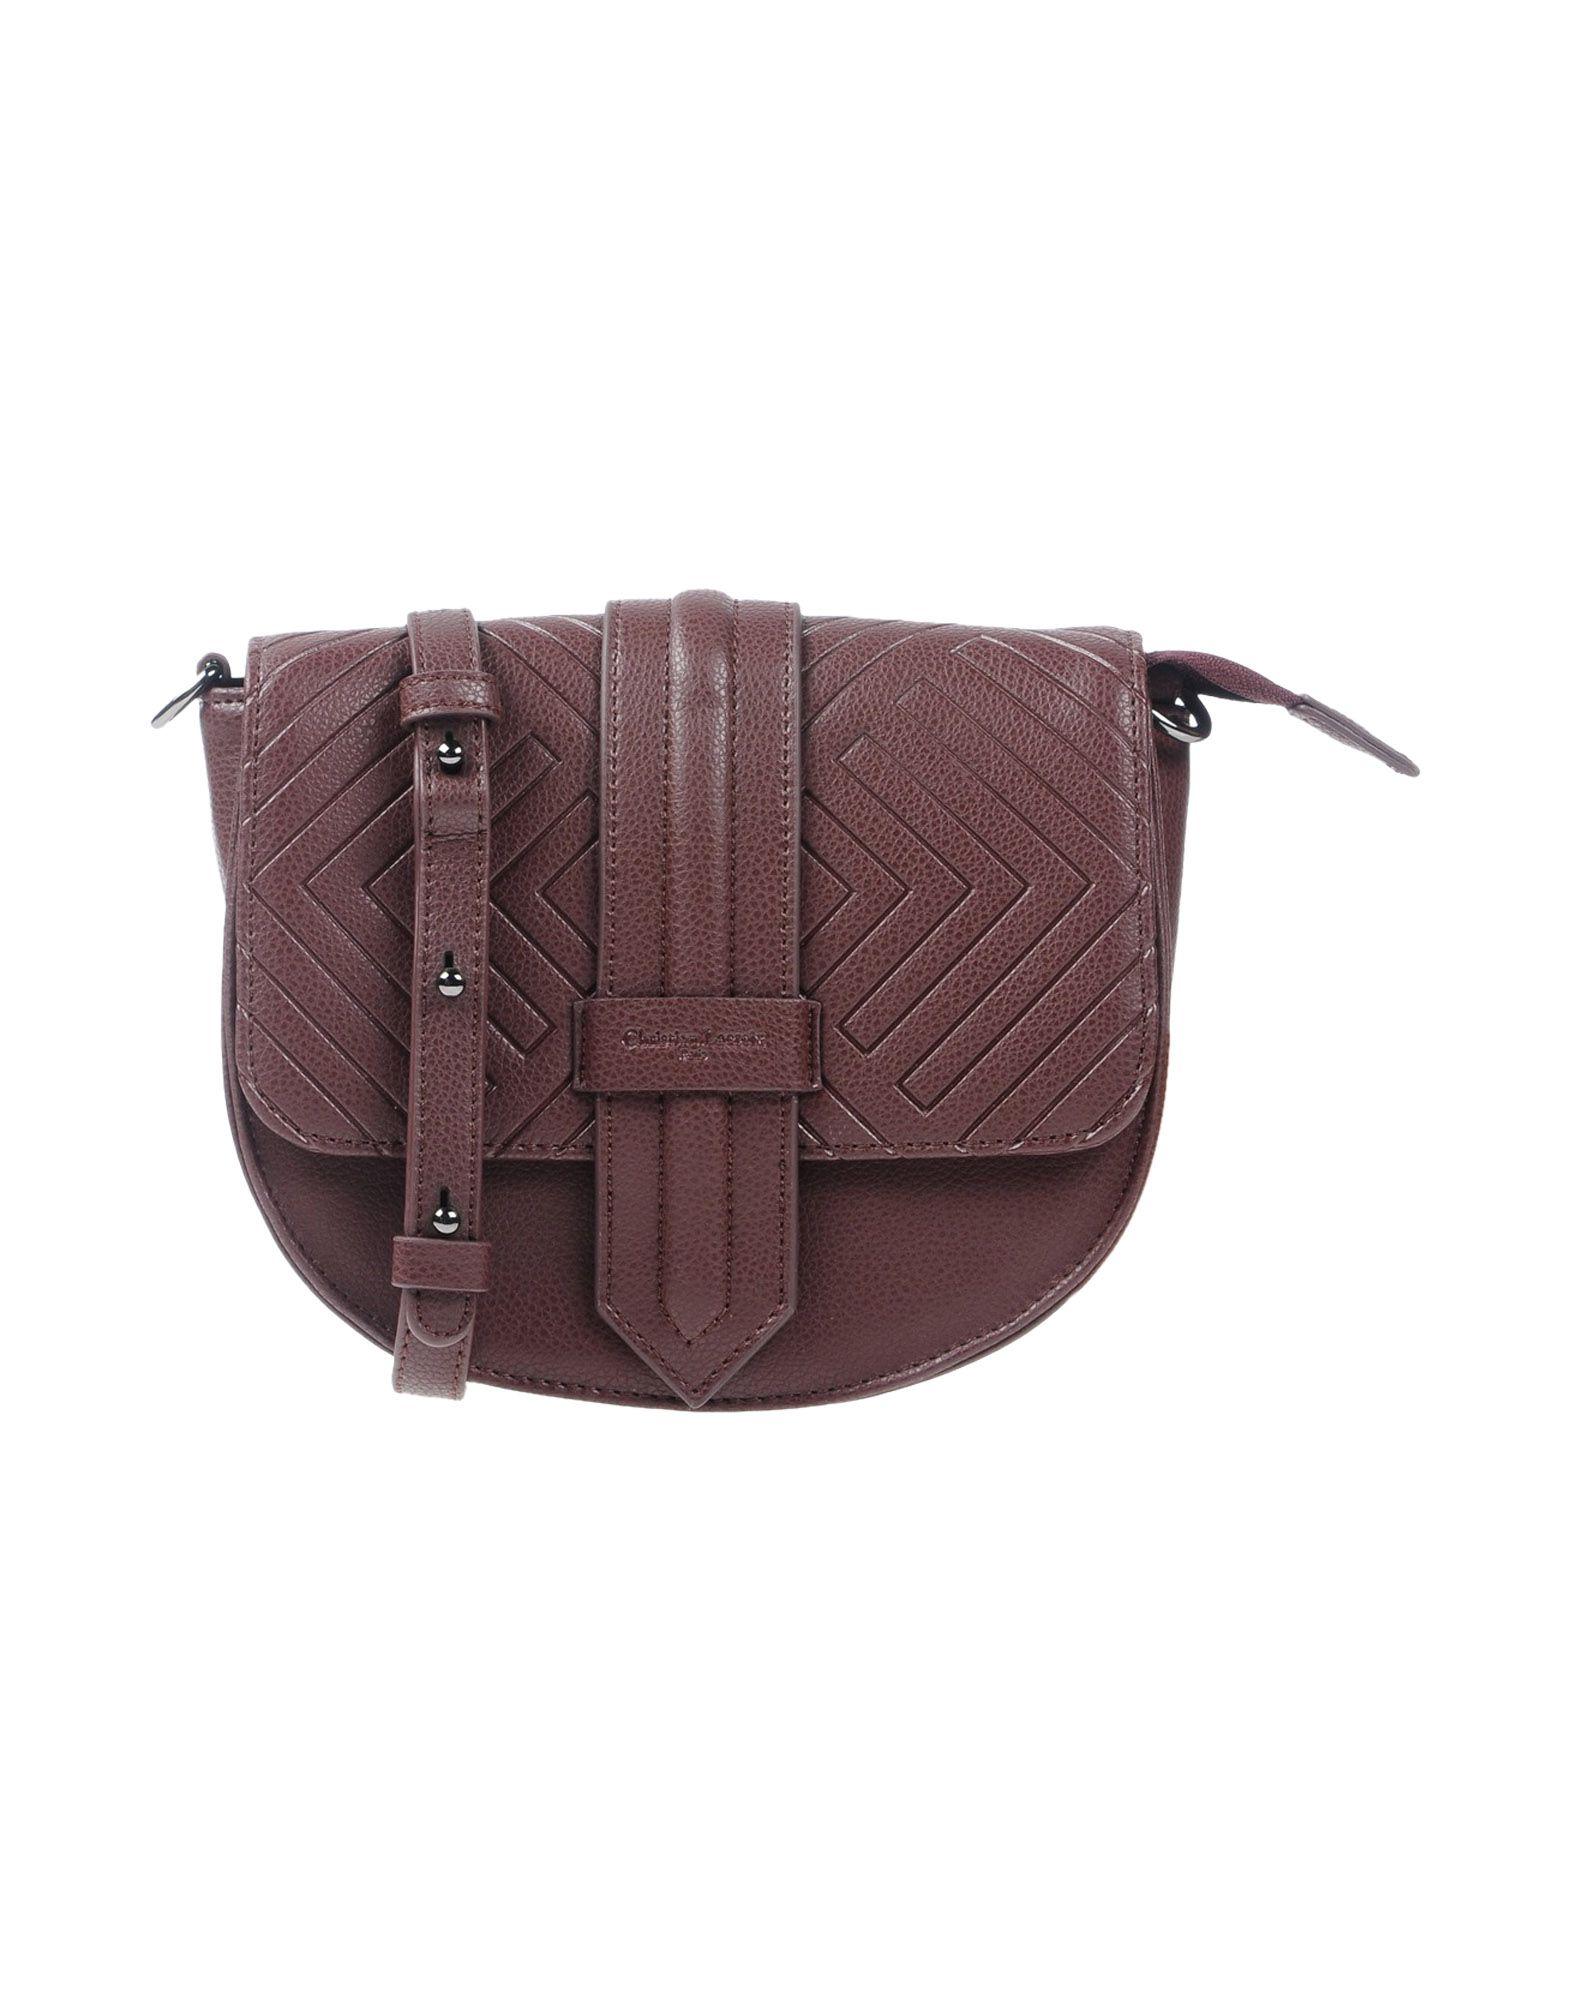 CHRISTIAN LACROIX Handbag in Cocoa